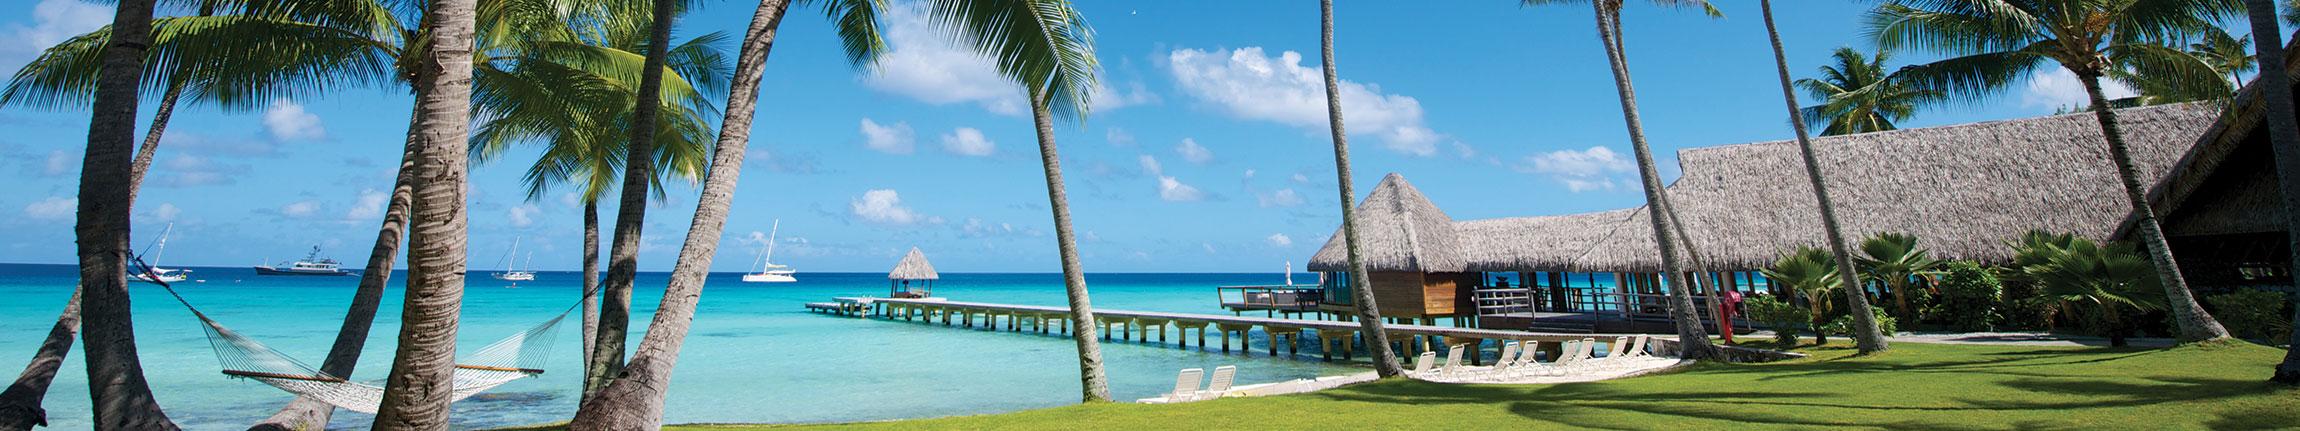 Four-Seasons-Resort-Bora-Bora-e-tahiti-travel-bandeau